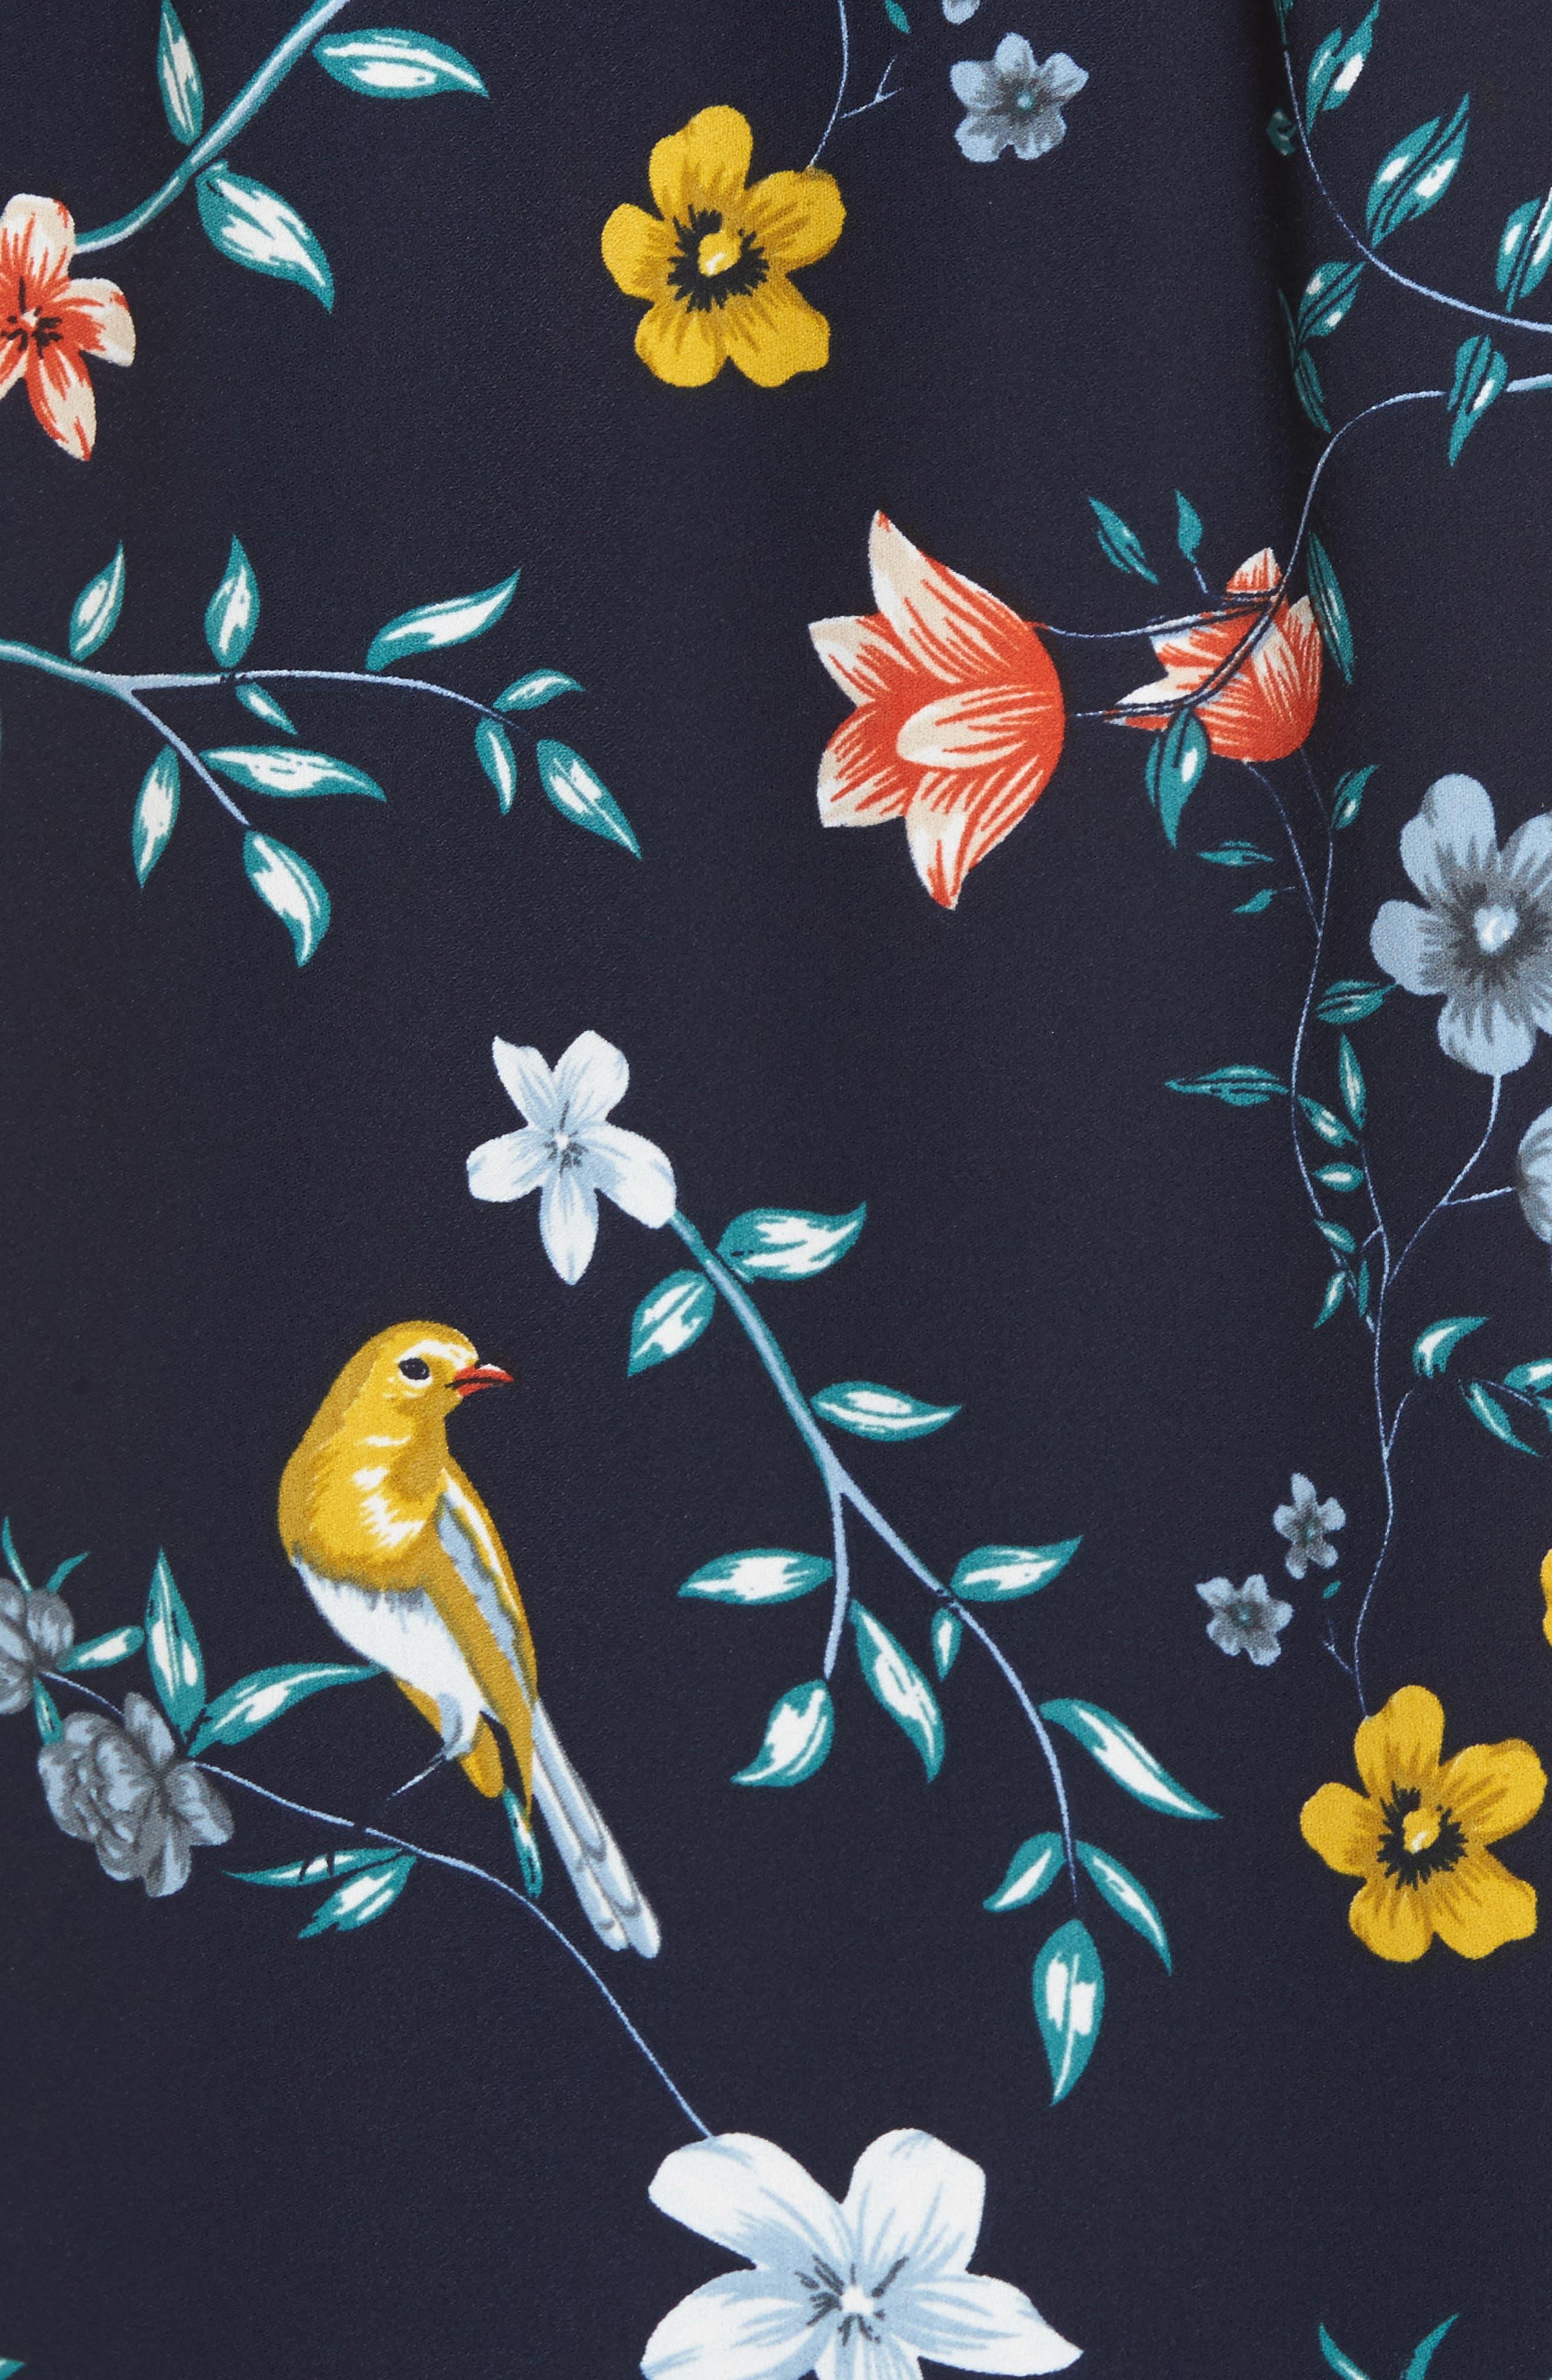 Linnea One-Shoulder Top,                             Alternate thumbnail 5, color,                             Floral Bird Print